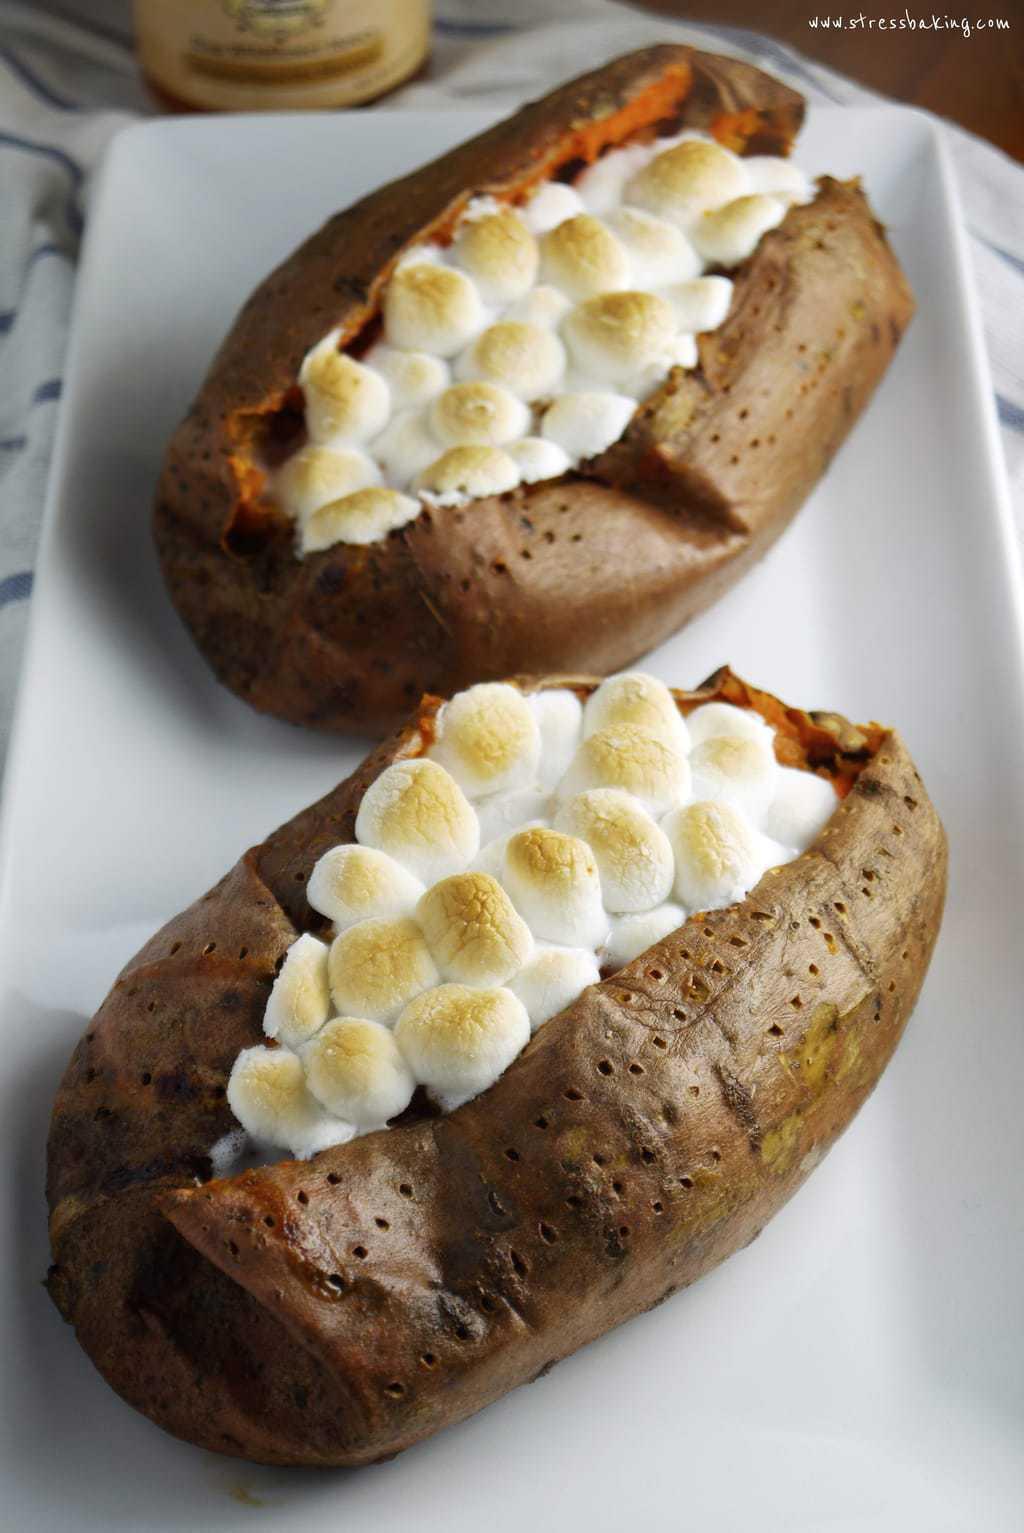 Twice-Baked Sweet Potatoes | Stress Baking